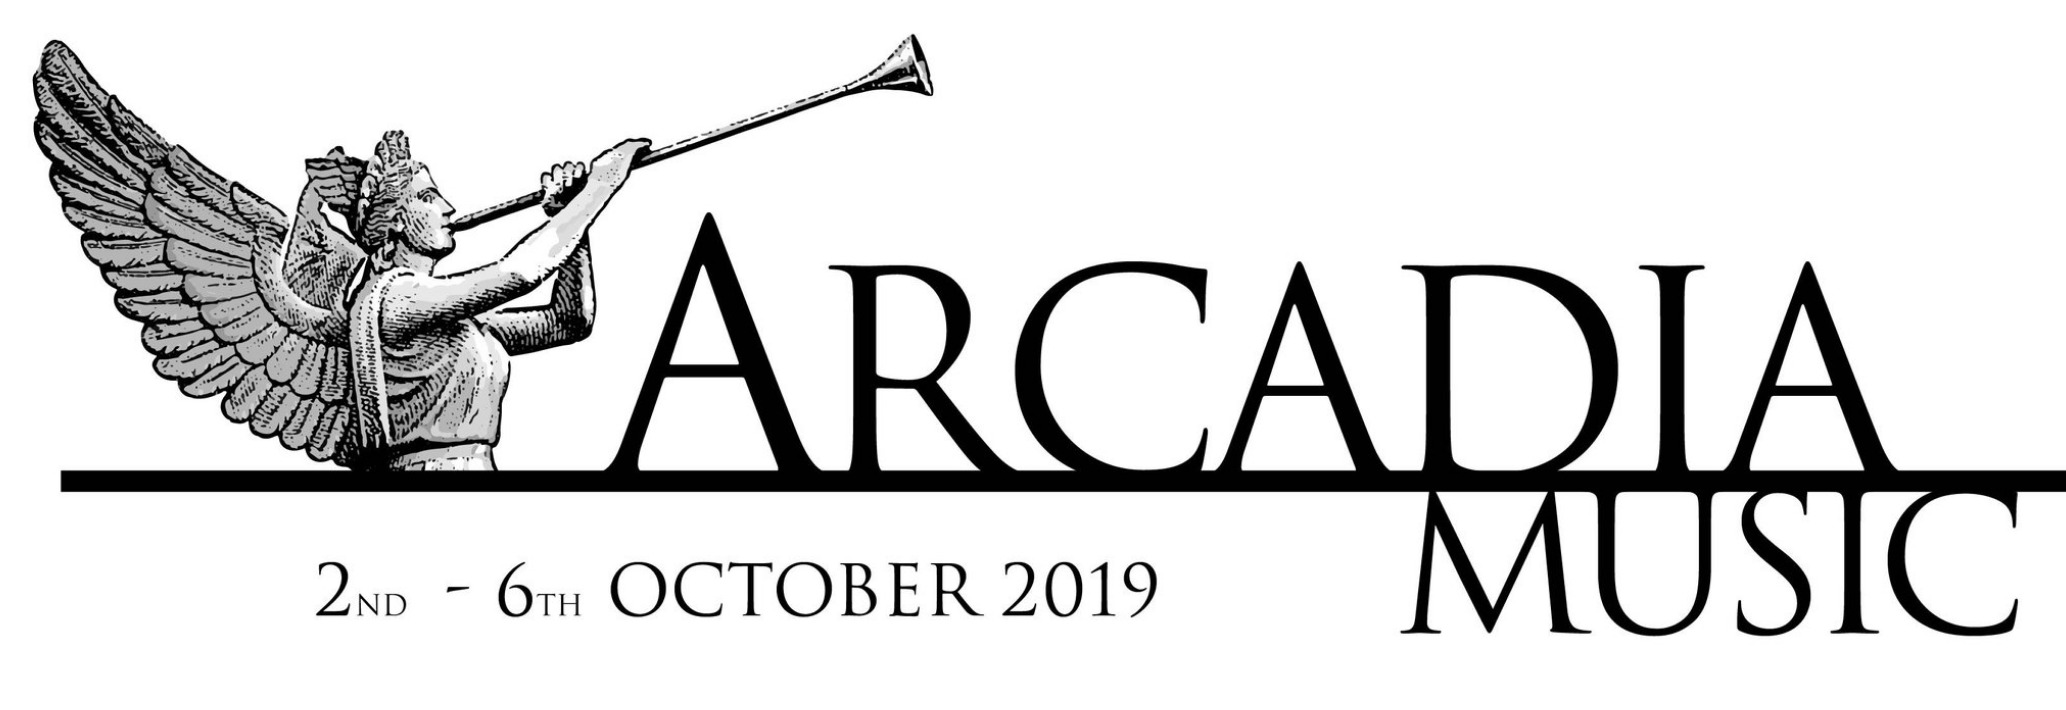 Arcadia_Music_Festival_2019_header.jpg